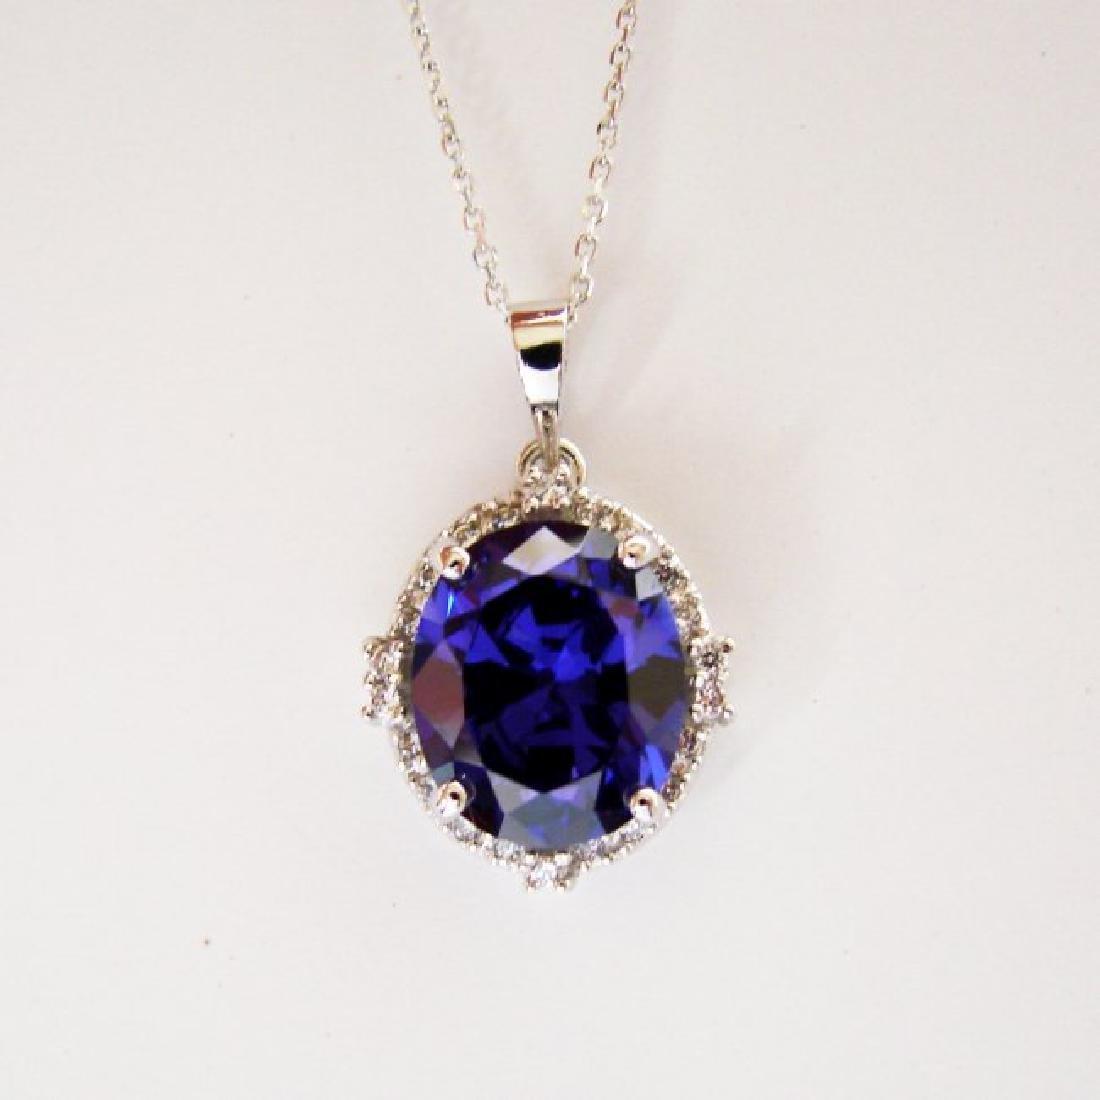 Creation Diamond/Tanzanite Pendant 7.72Ct 18k W/g